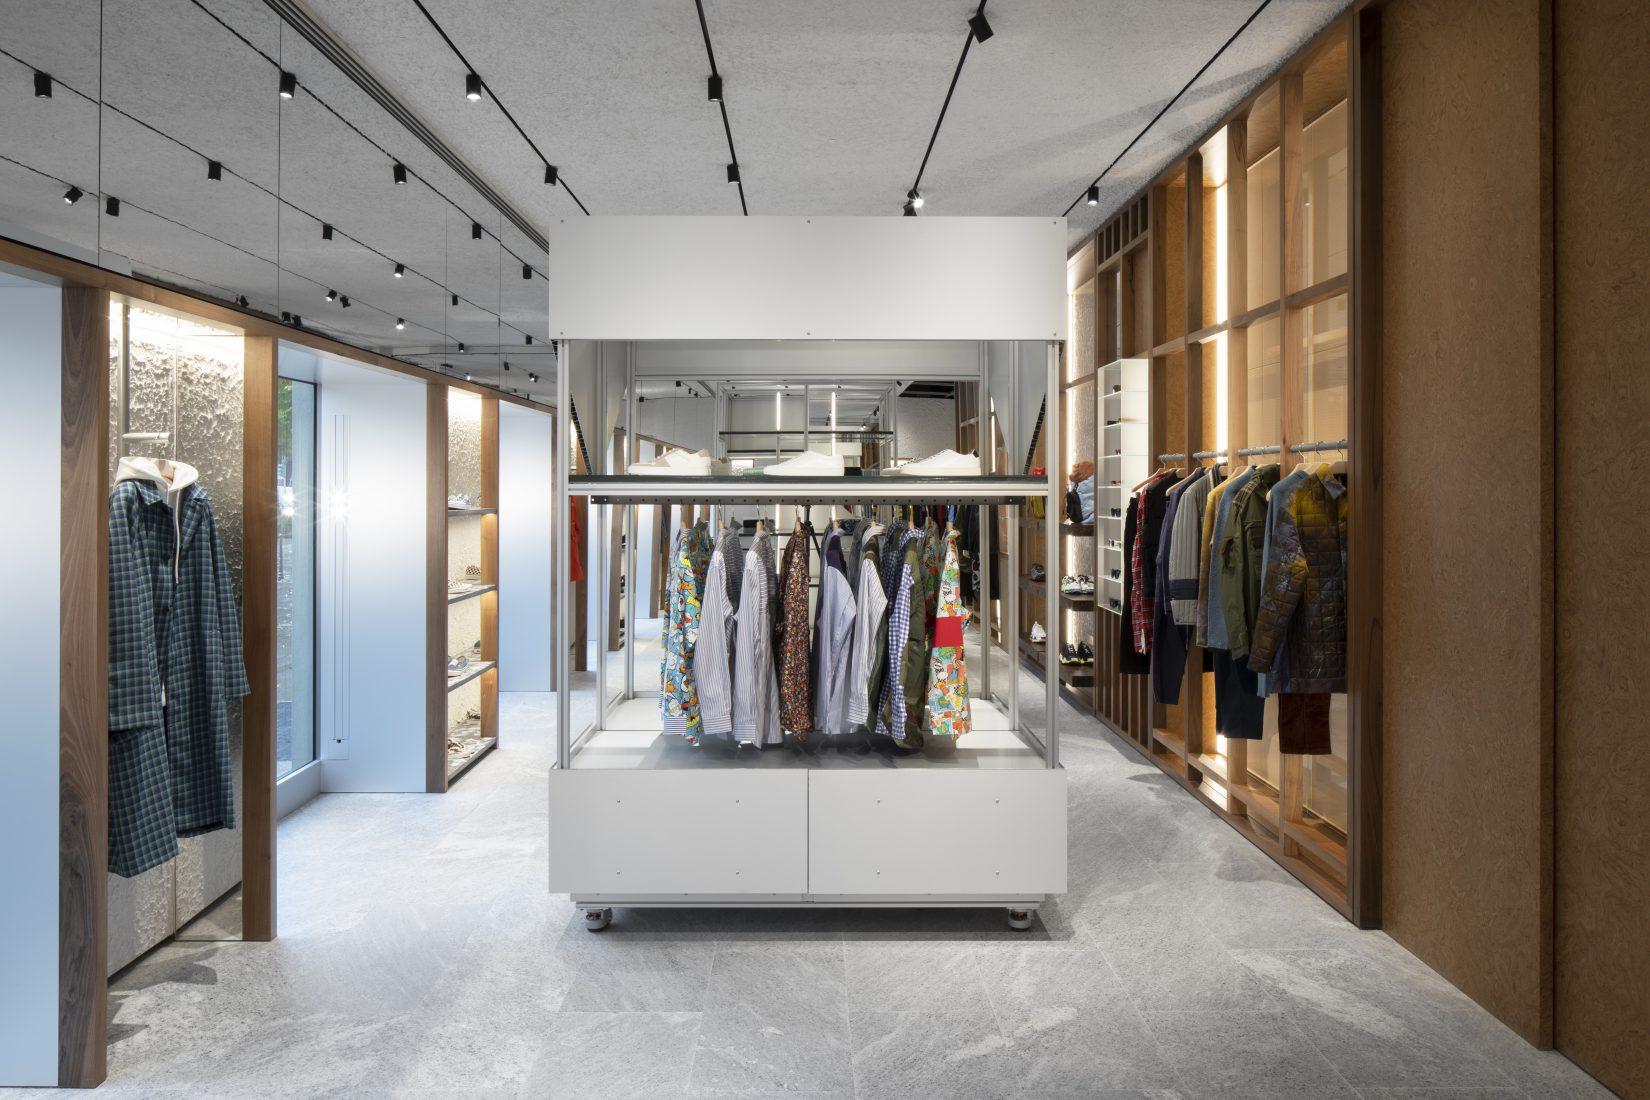 Luxury retail as reimagined by Aldo Carpinteri's vision